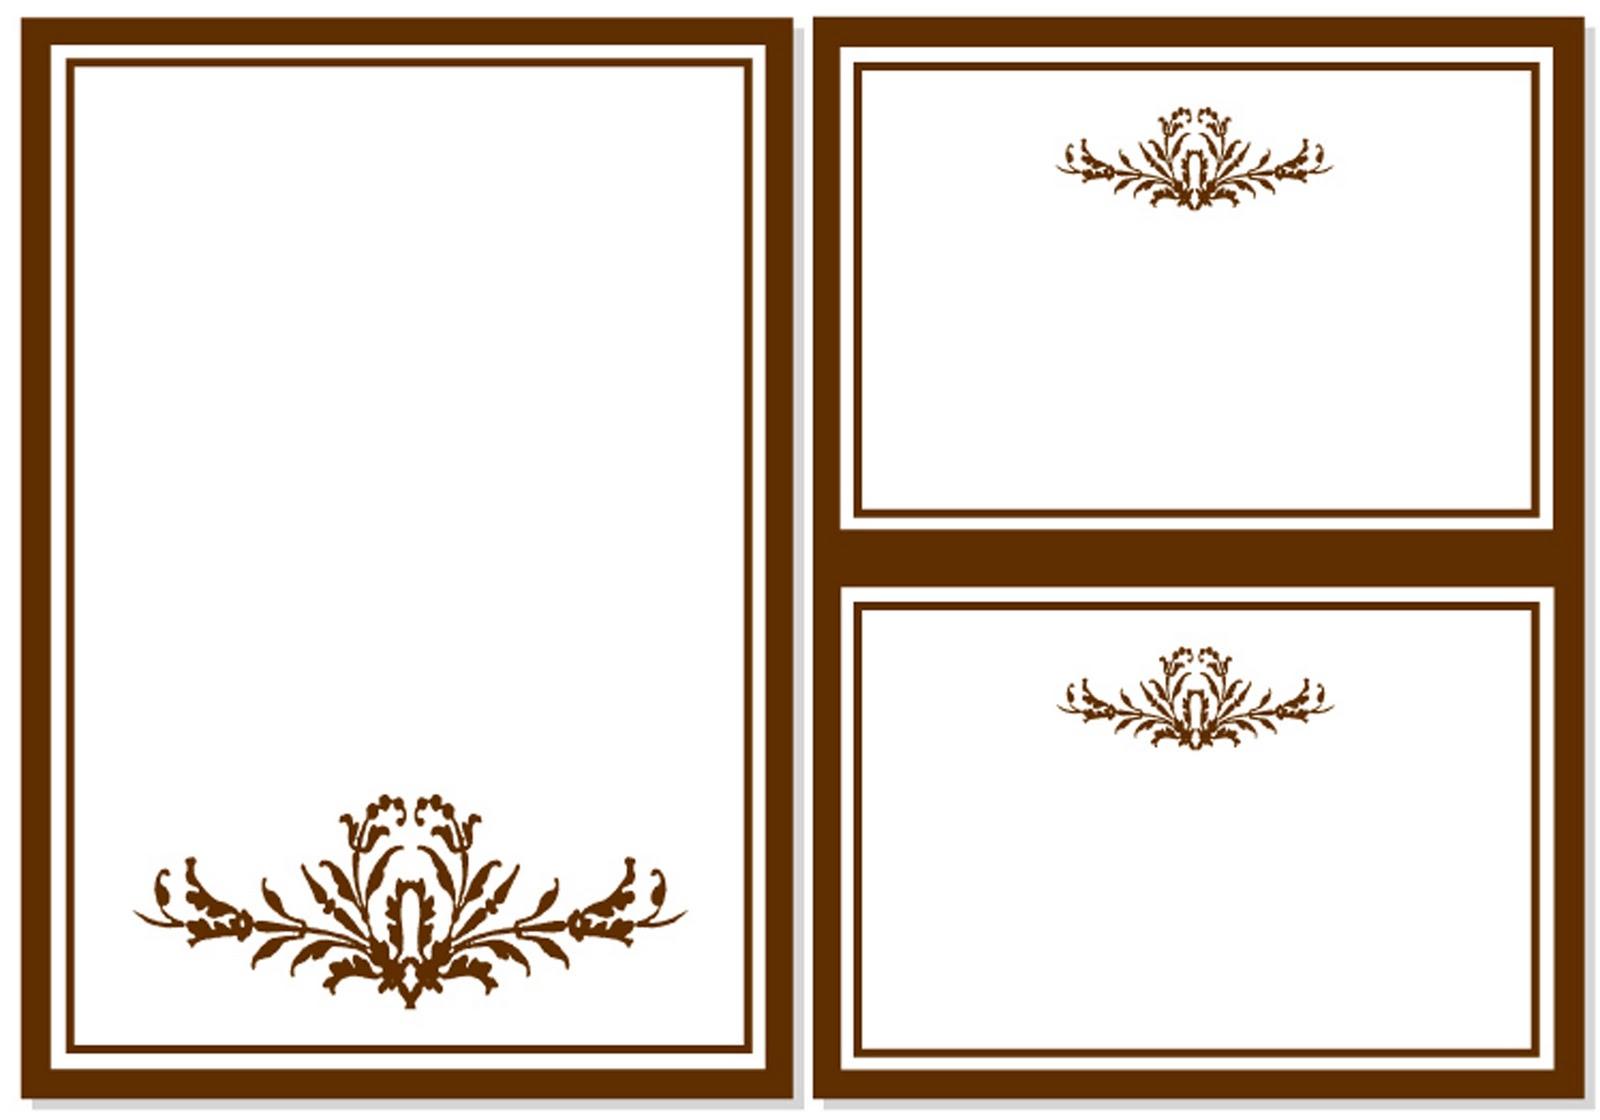 fiesta de chocolate. Black Bedroom Furniture Sets. Home Design Ideas